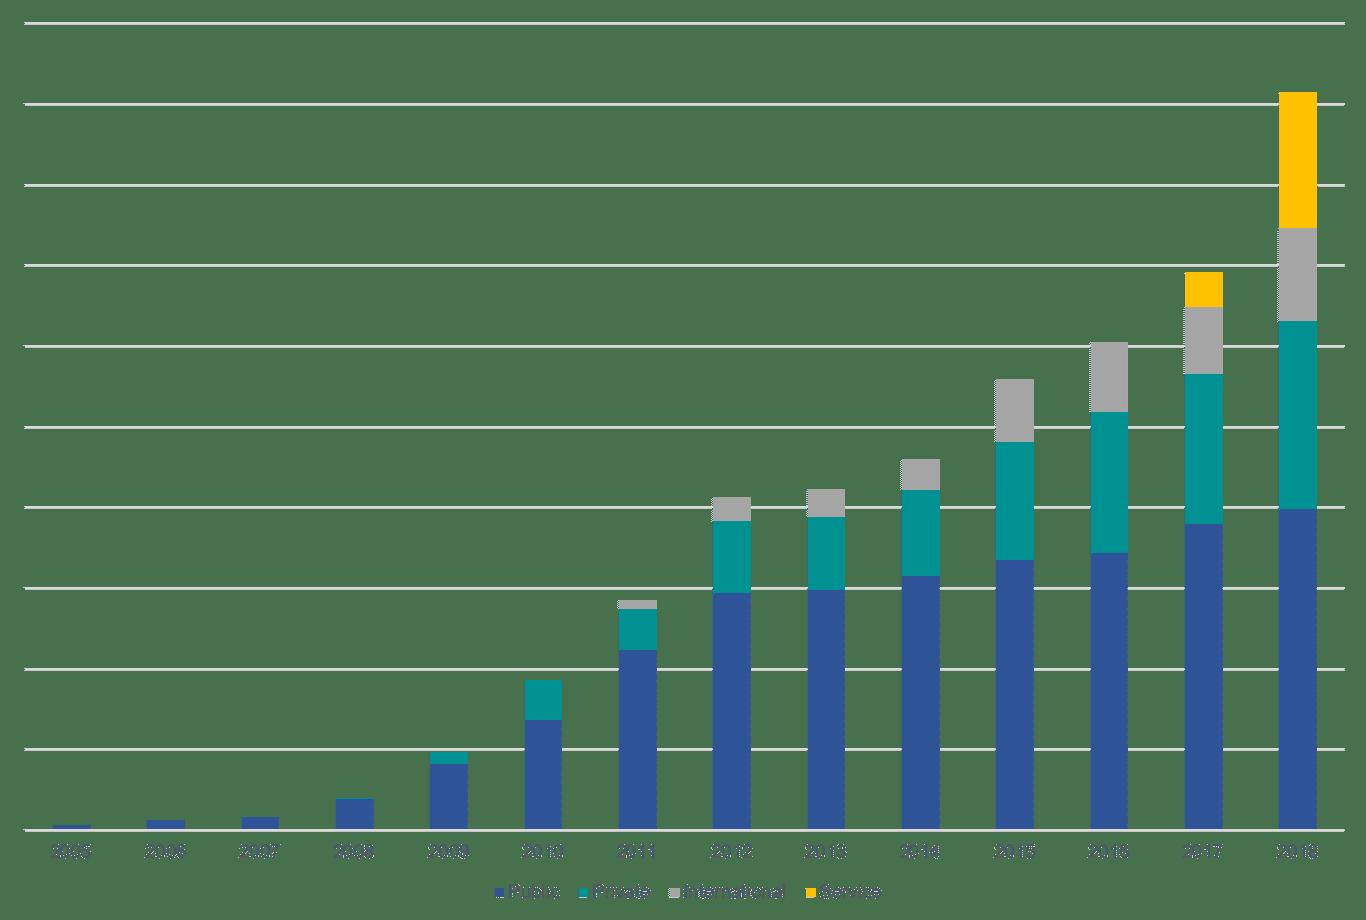 CP Growth 2